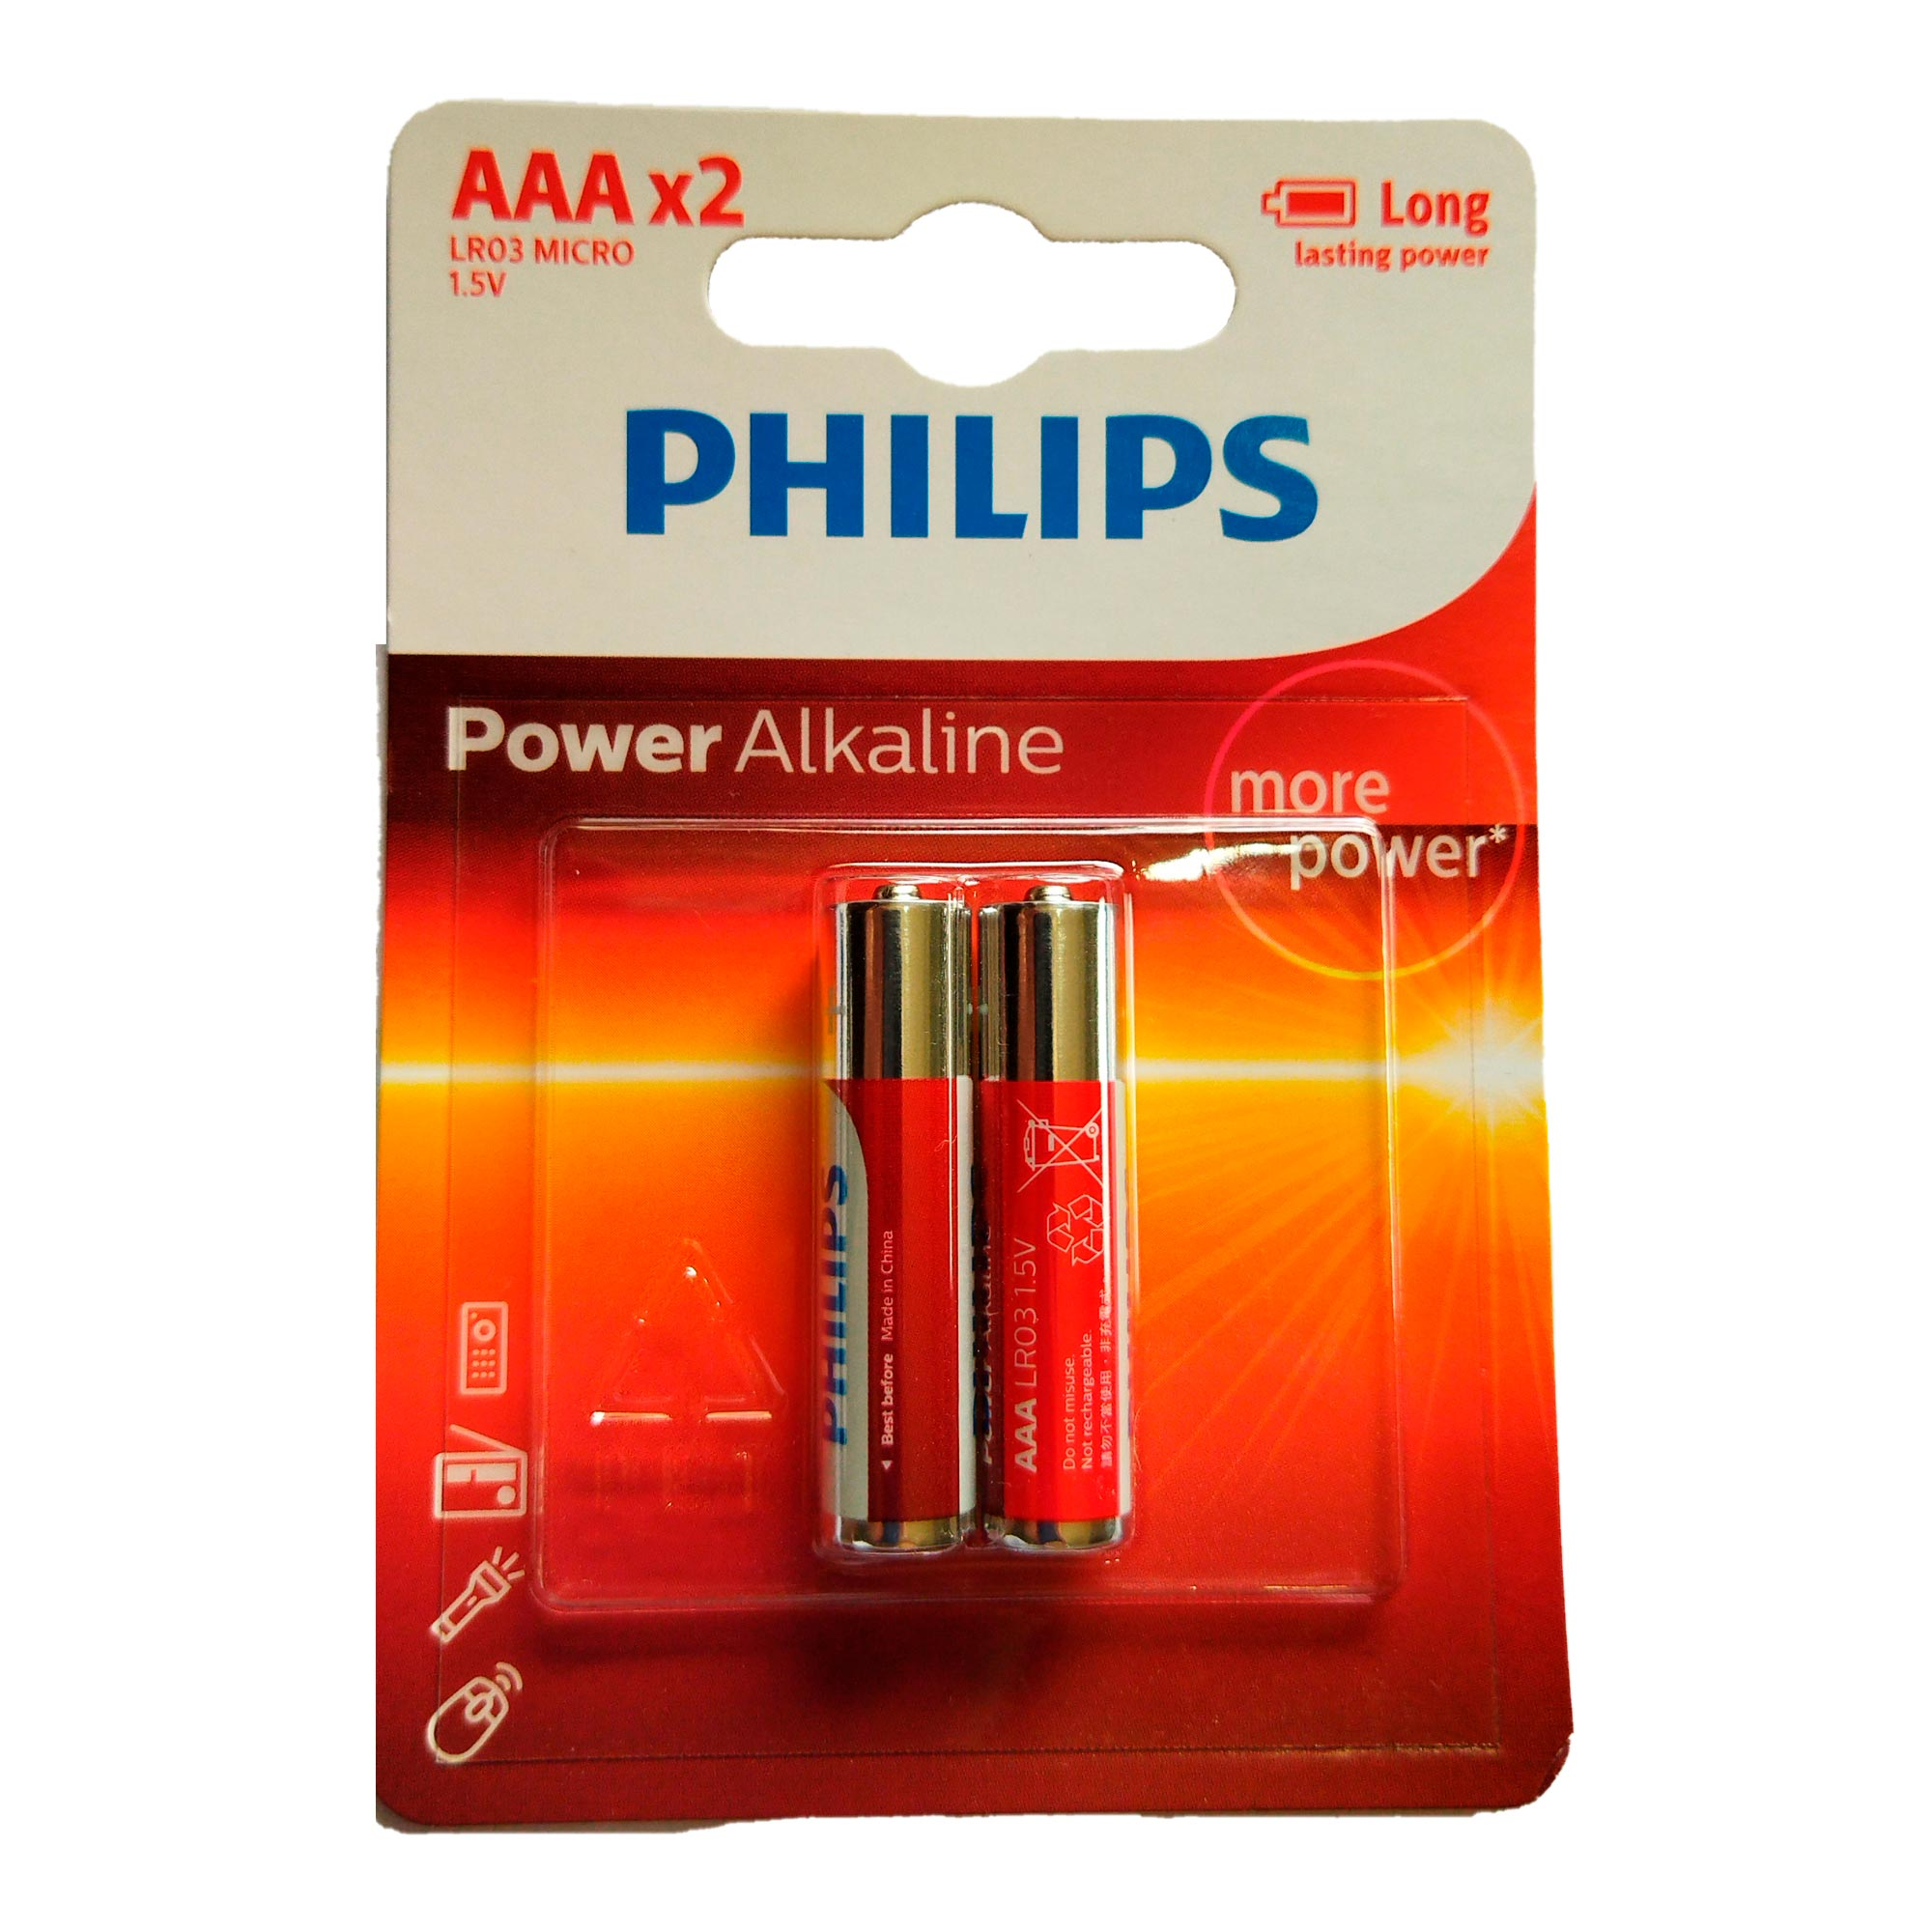 24 Pilhas Alcalinas AAA Palito Philips 1,5v LR03P2B/97